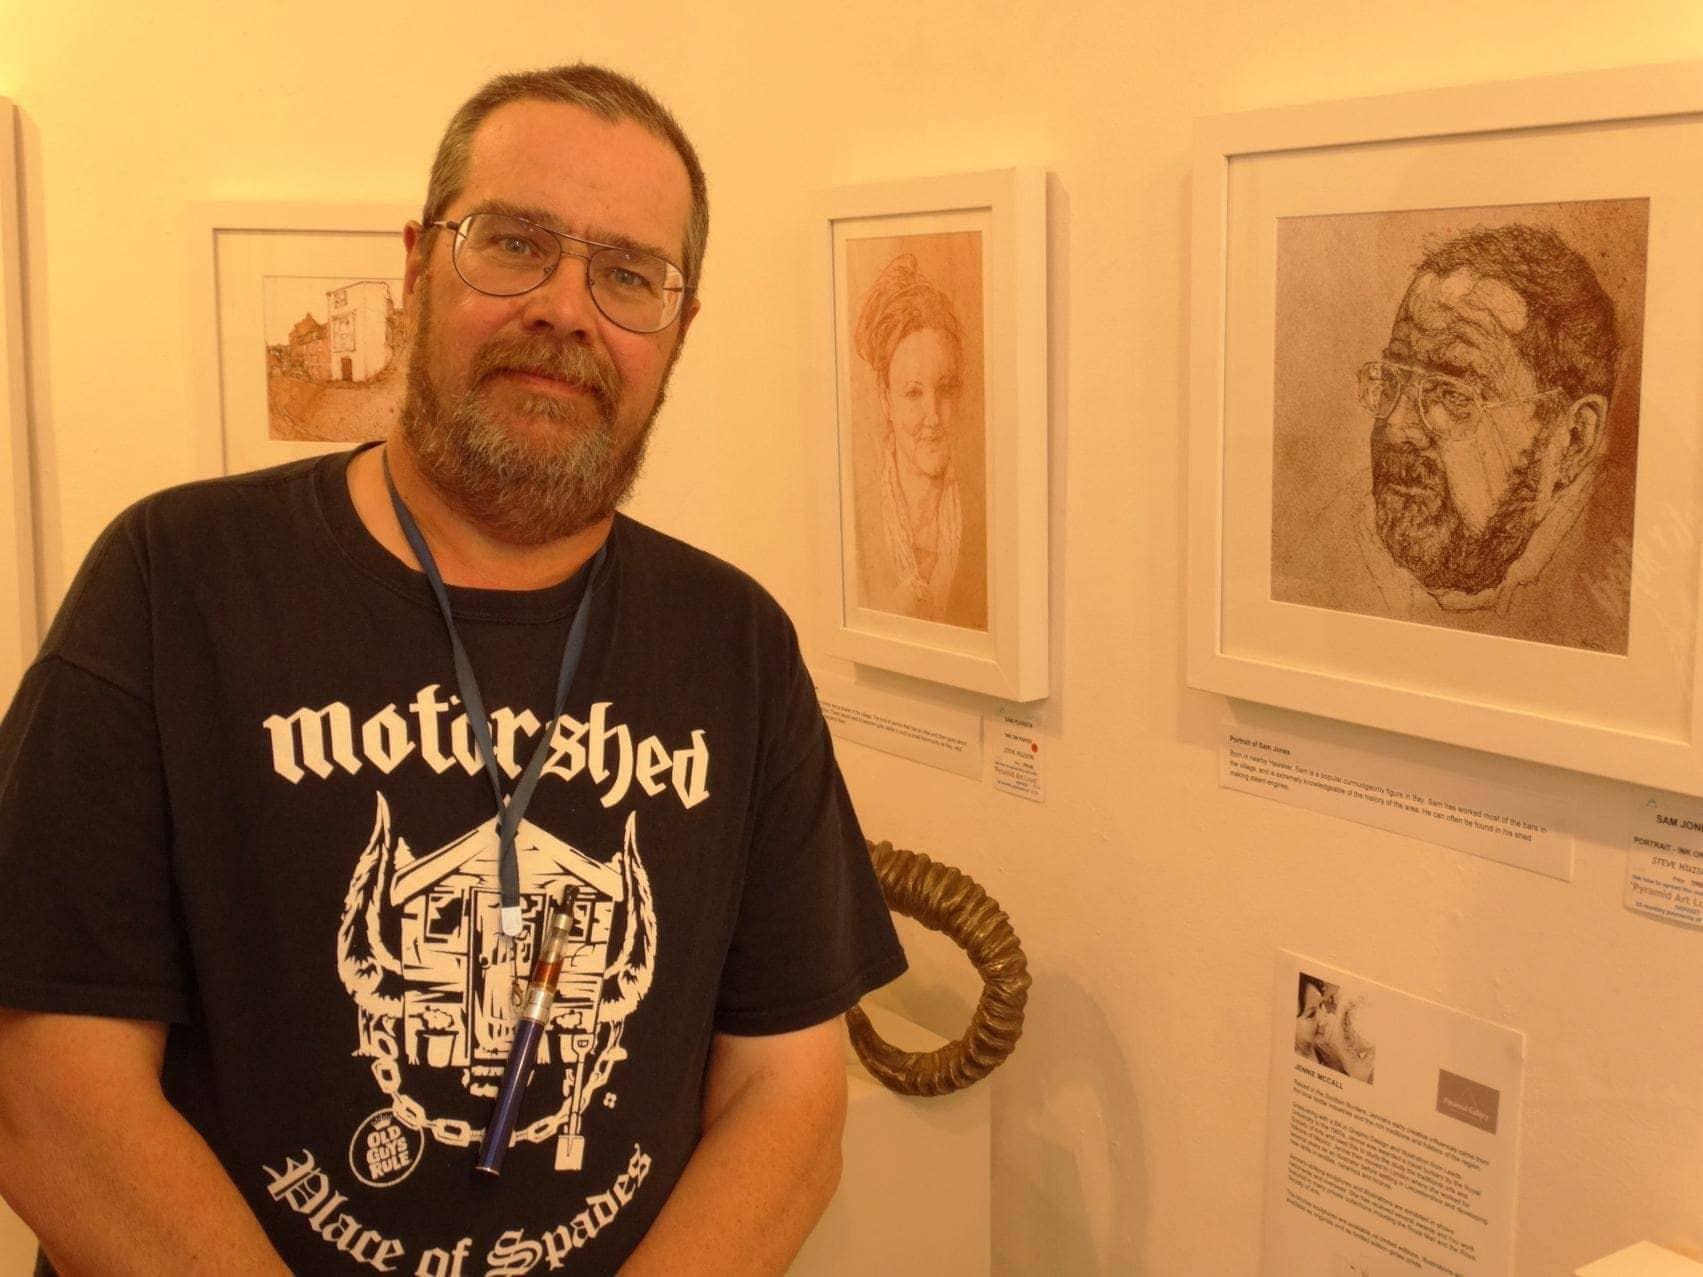 Bay resident Sam Jones with his portrait